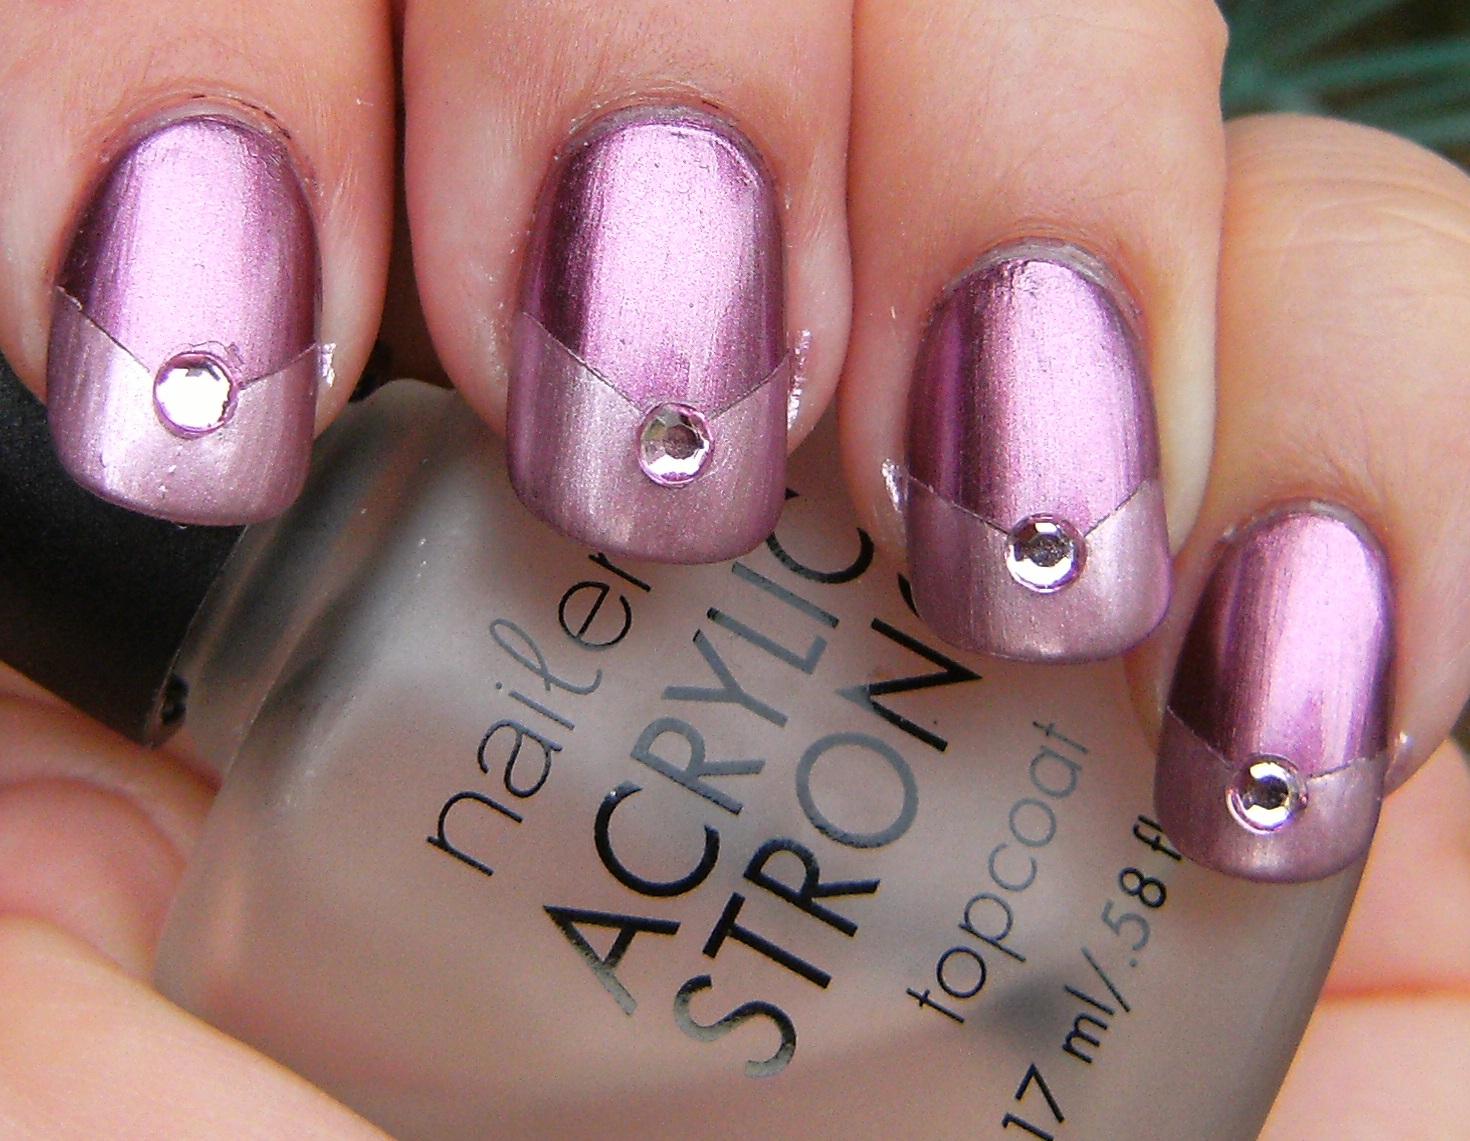 http://4.bp.blogspot.com/_bvQ4YJ17888/TCTu5YAgF6I/AAAAAAAAQ0U/q9xqdxG1rik/s1600/sally+hansen+anemone++diamond+chrome+and+fiery+pink+diamond+chrome+chevron+tips+----deez-nailz---+%2814%29.JPG